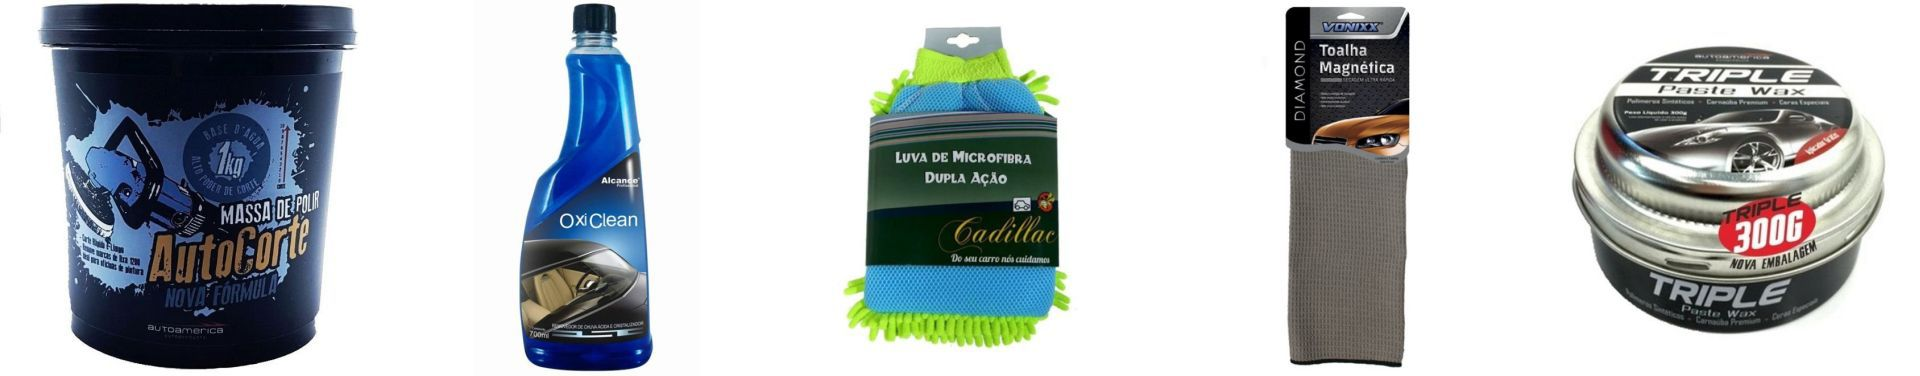 Kit Massa de Polir+OxiClean+Luva+Toalha Magnetica+Cera Triple